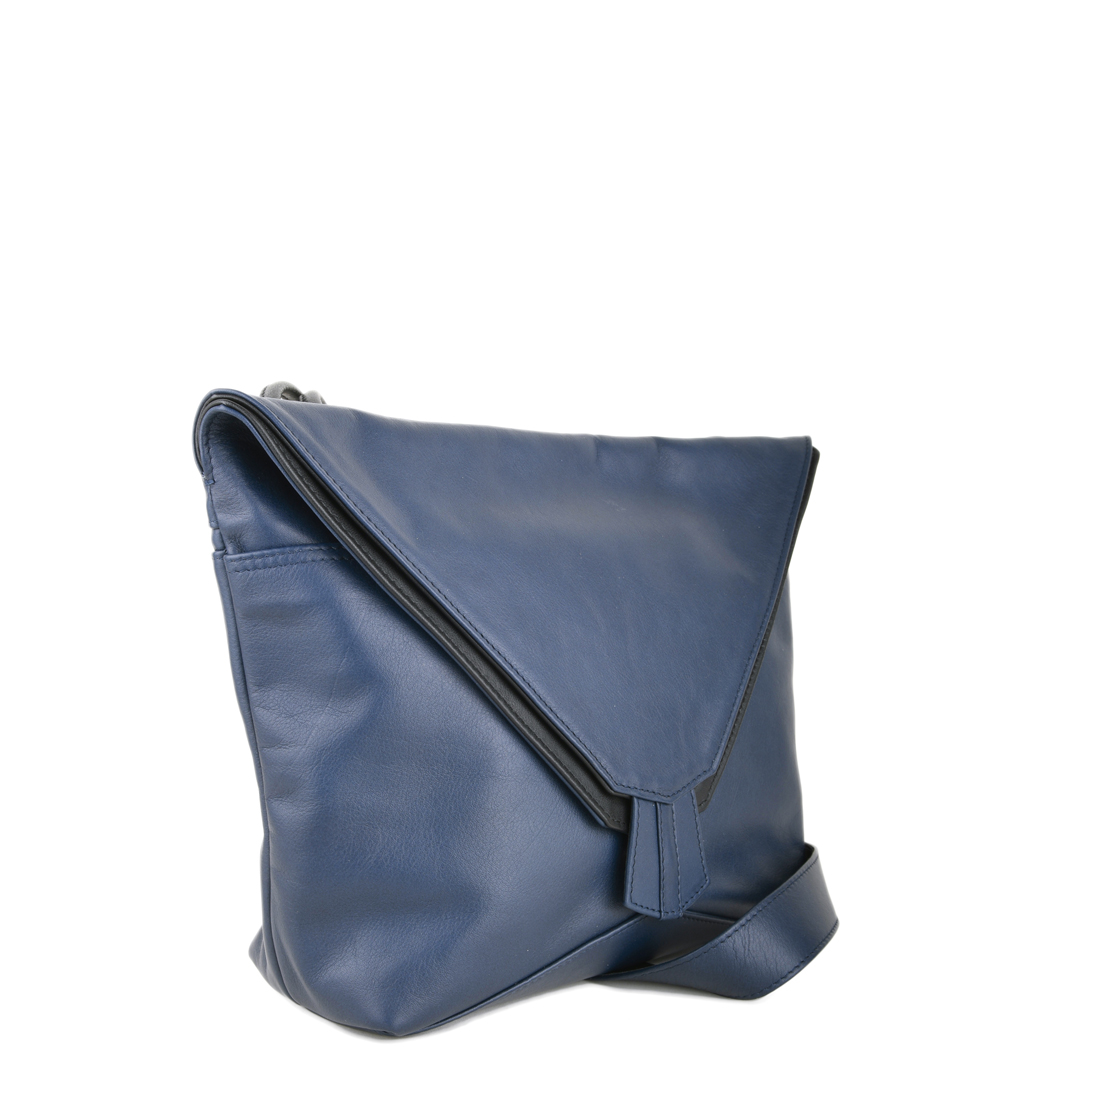 Emma Navy Across Body Bag